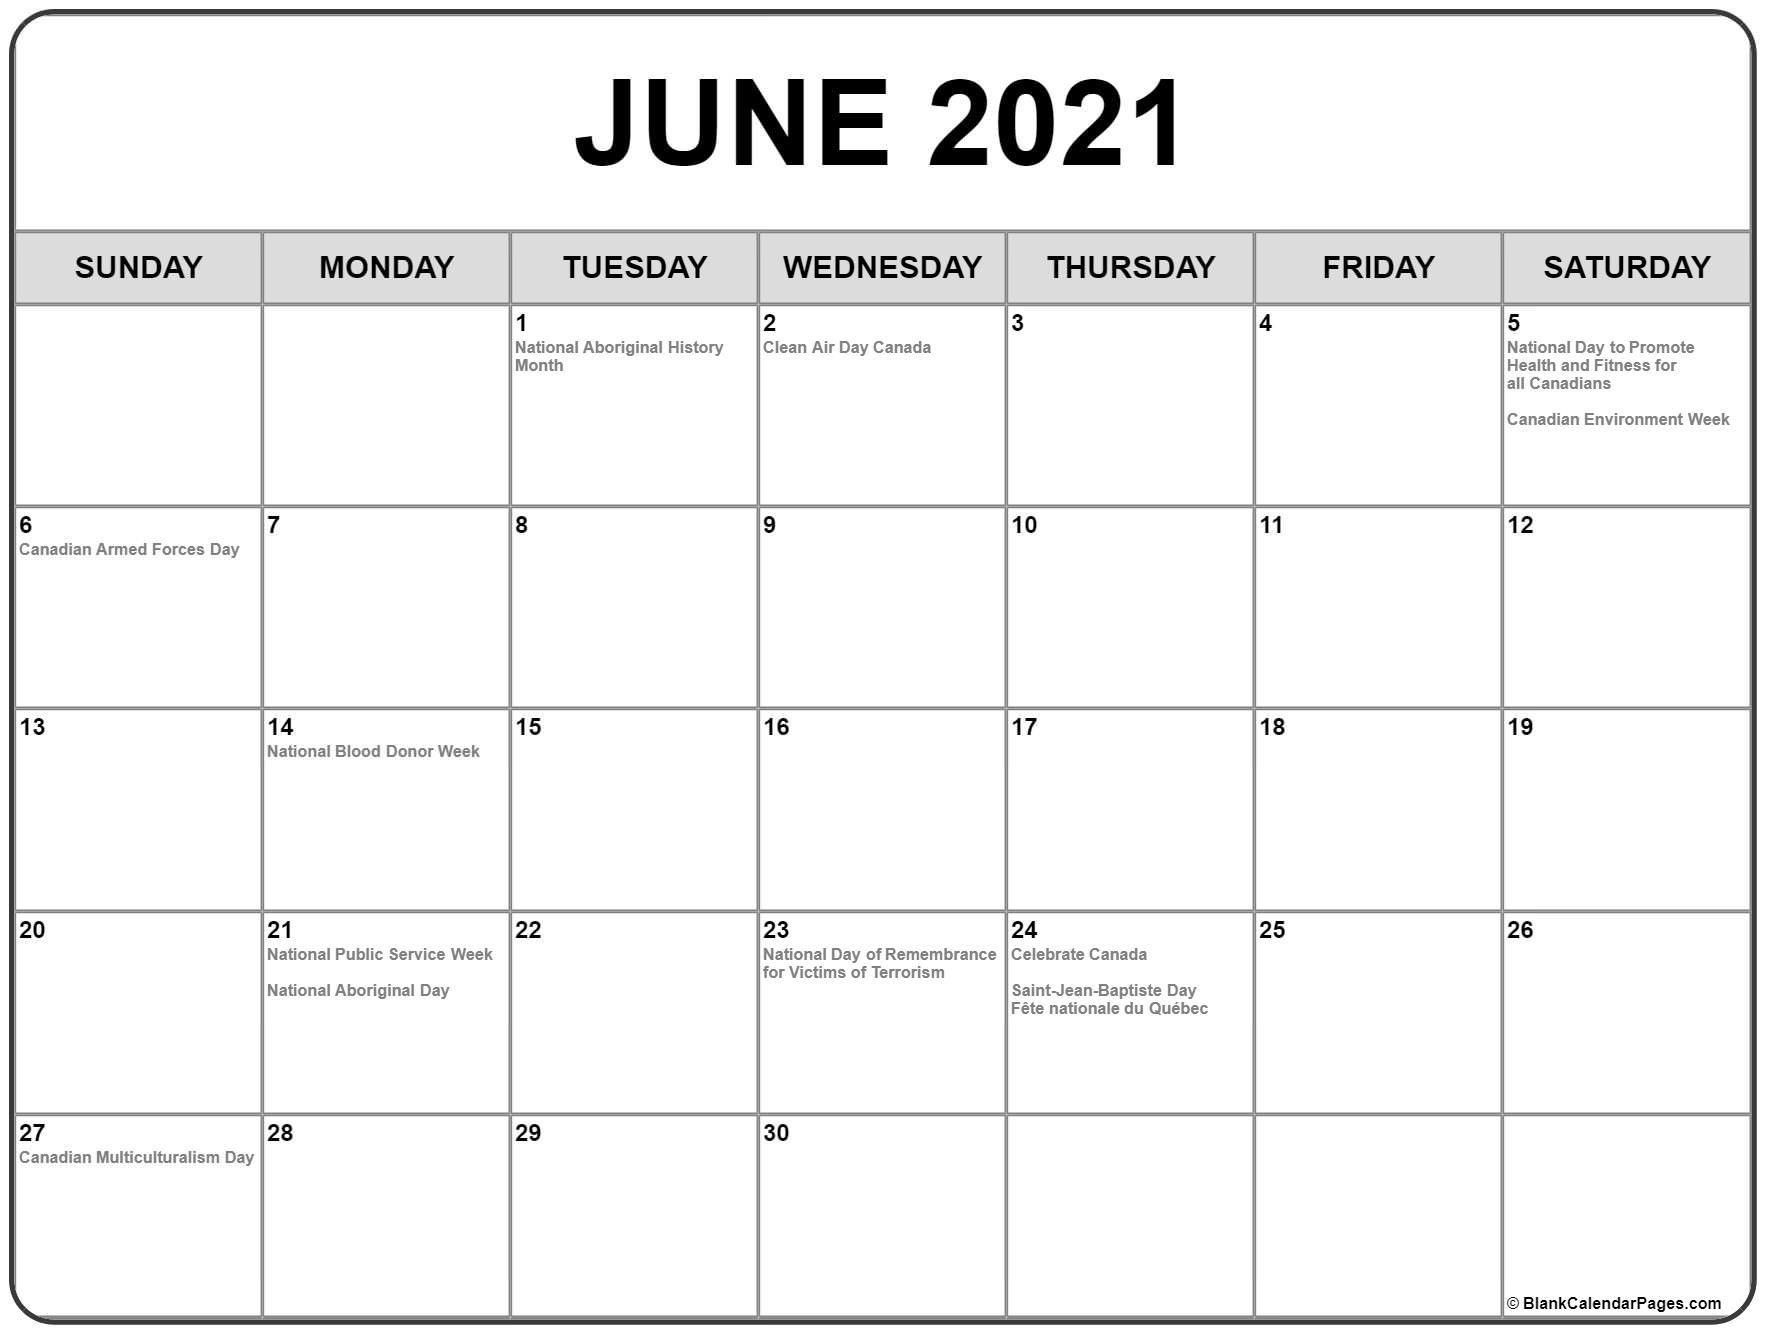 June 2021 Calendar With Holidays - Calendar 2021 June 2021 Calendar With Holidays Printable